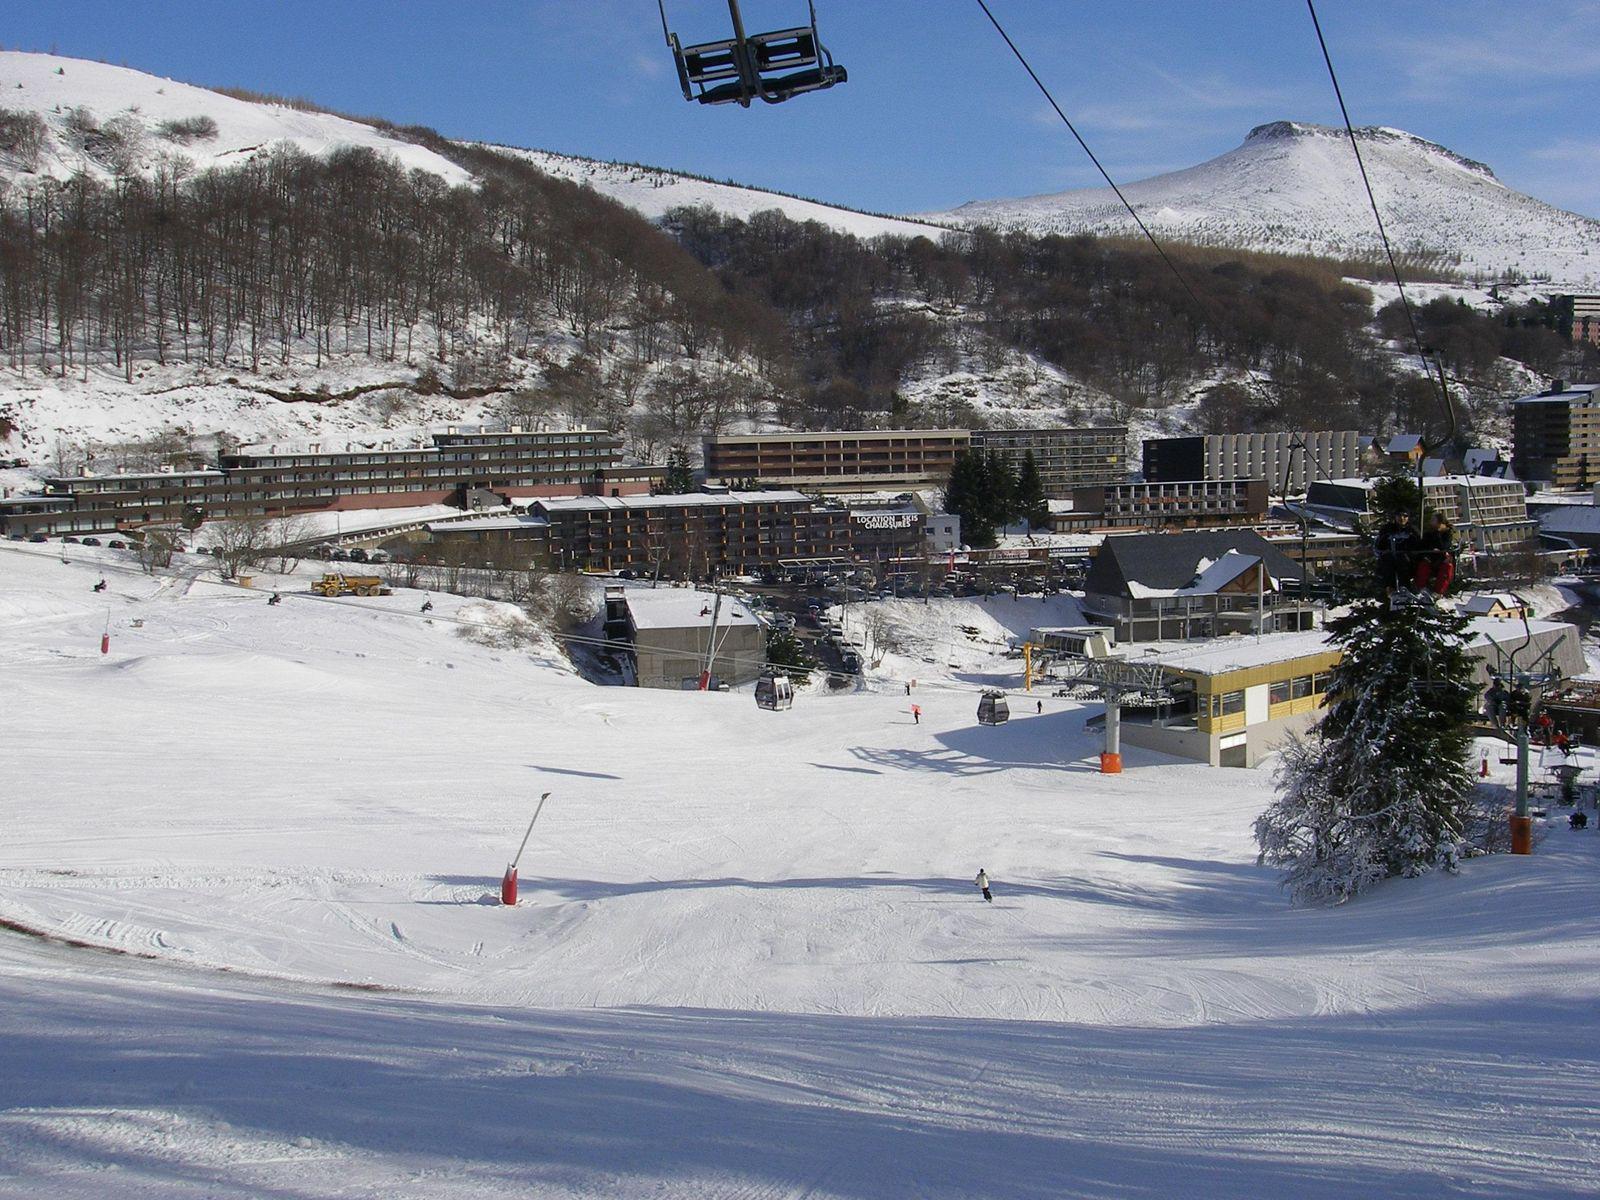 Station de ski de Besse Super Besse_Besse-et-Saint-Anastaise